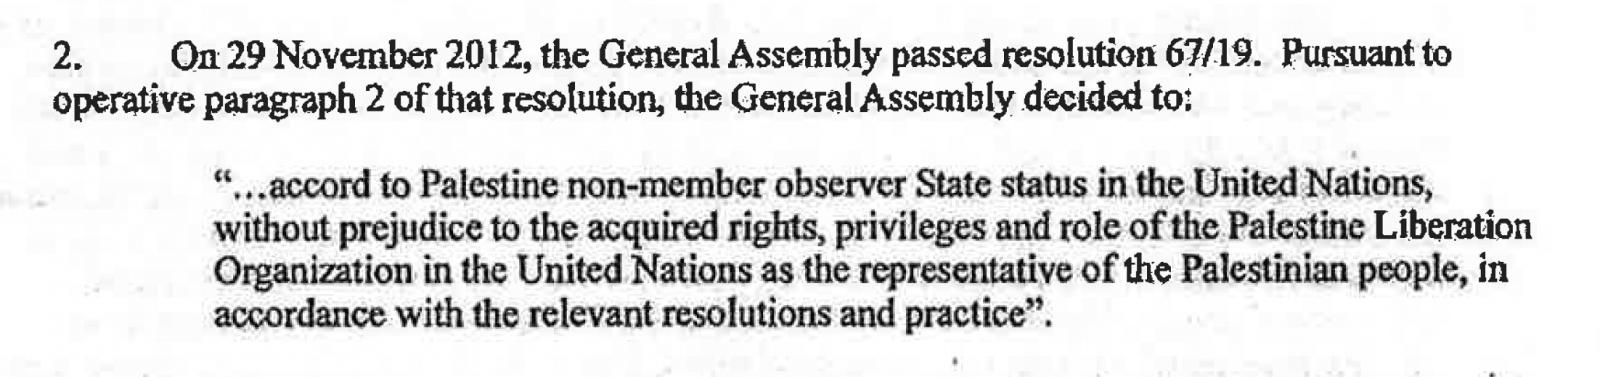 Exscerpt• 2012 Memo • UN Legal Affairs Ofc.png